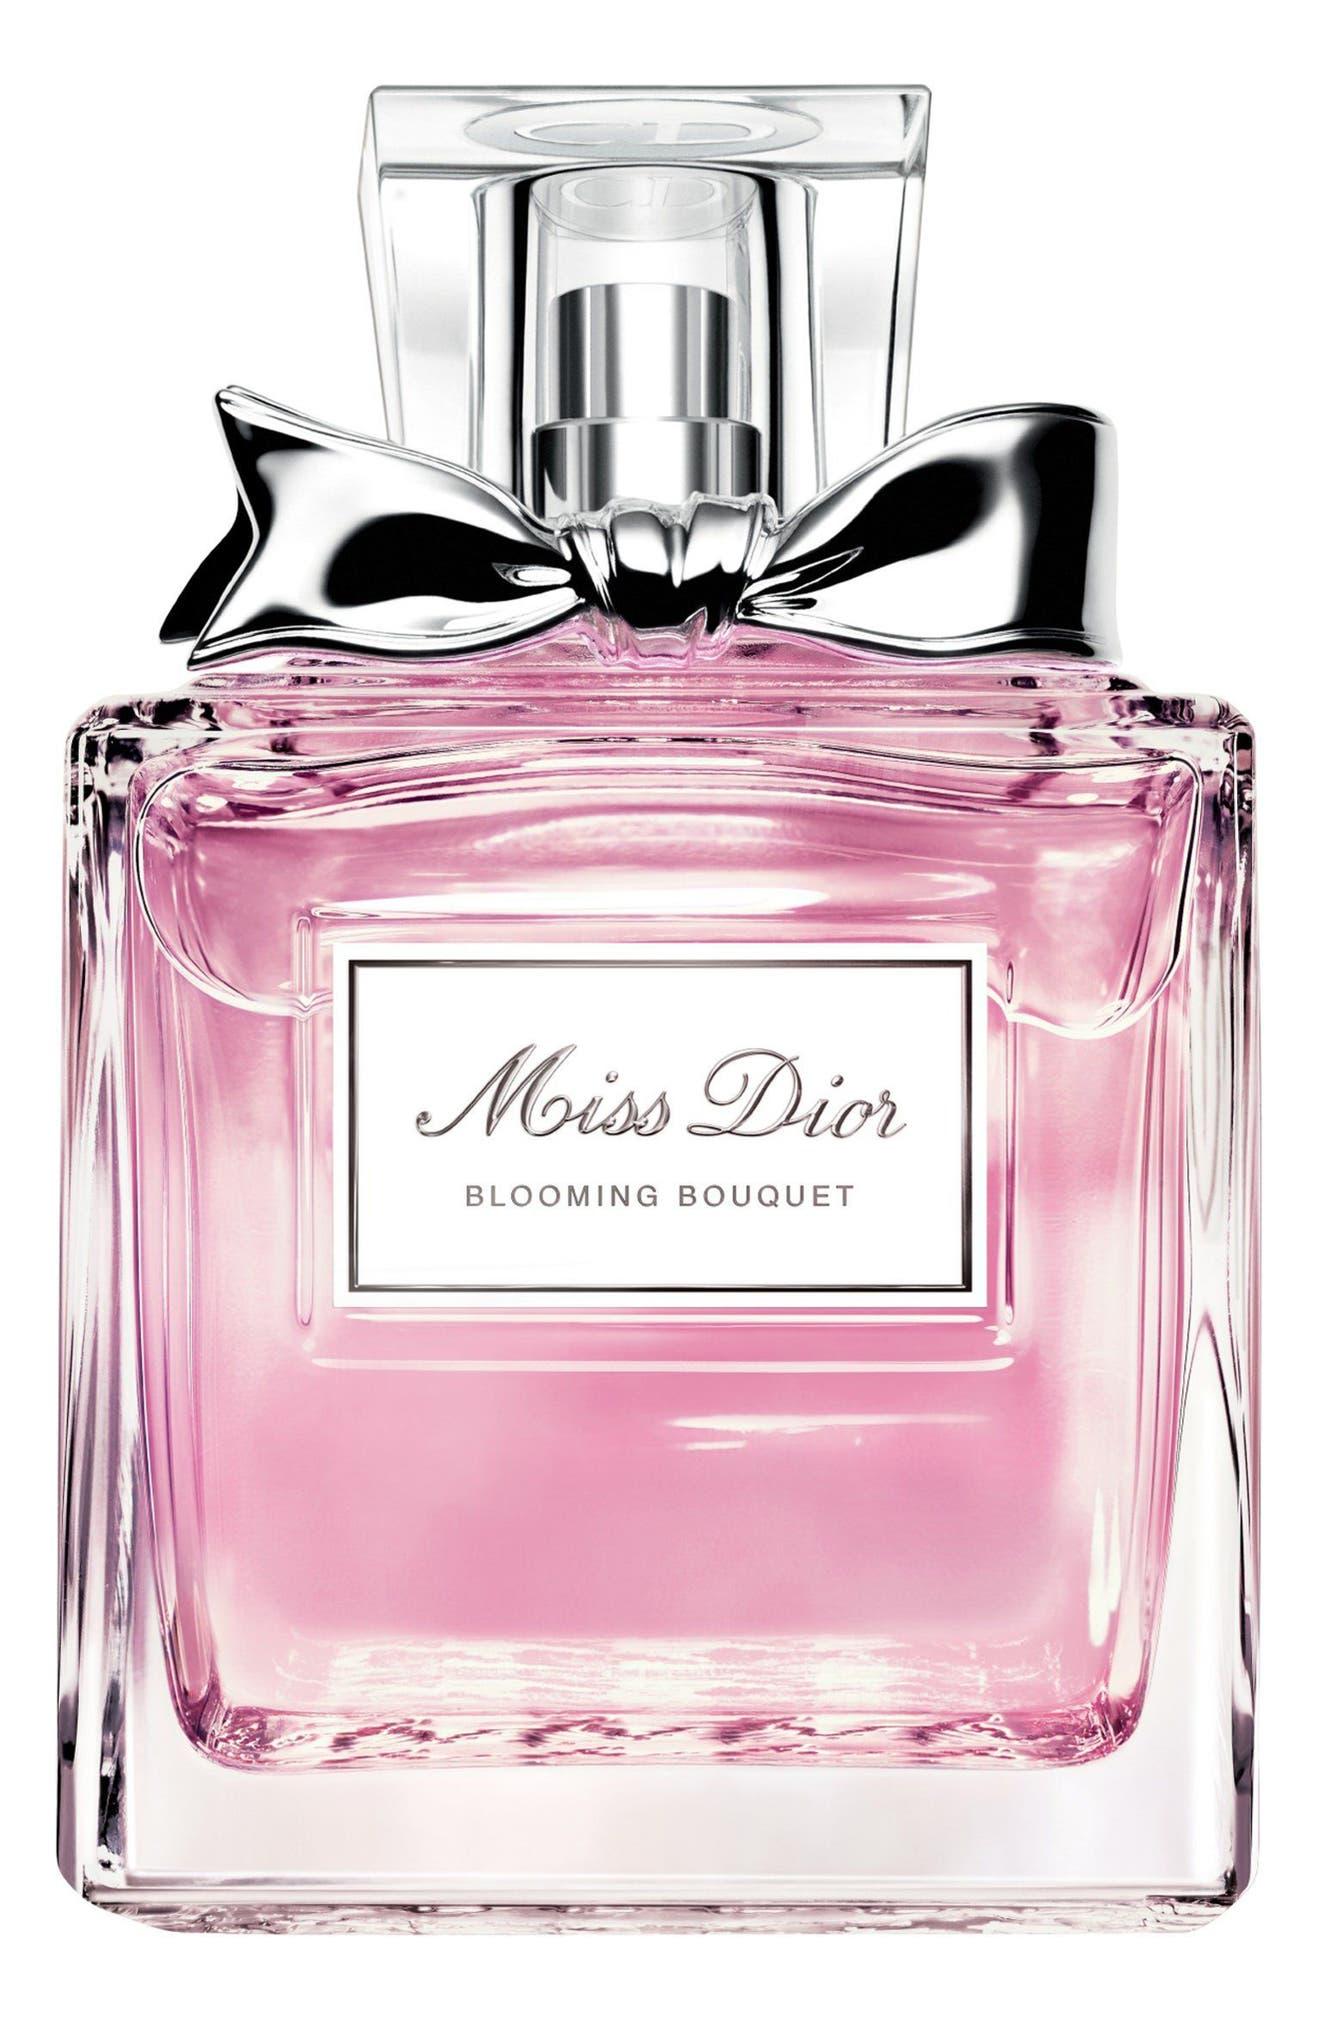 Dior miss dior blooming bouquet eau de toilette nordstrom izmirmasajfo